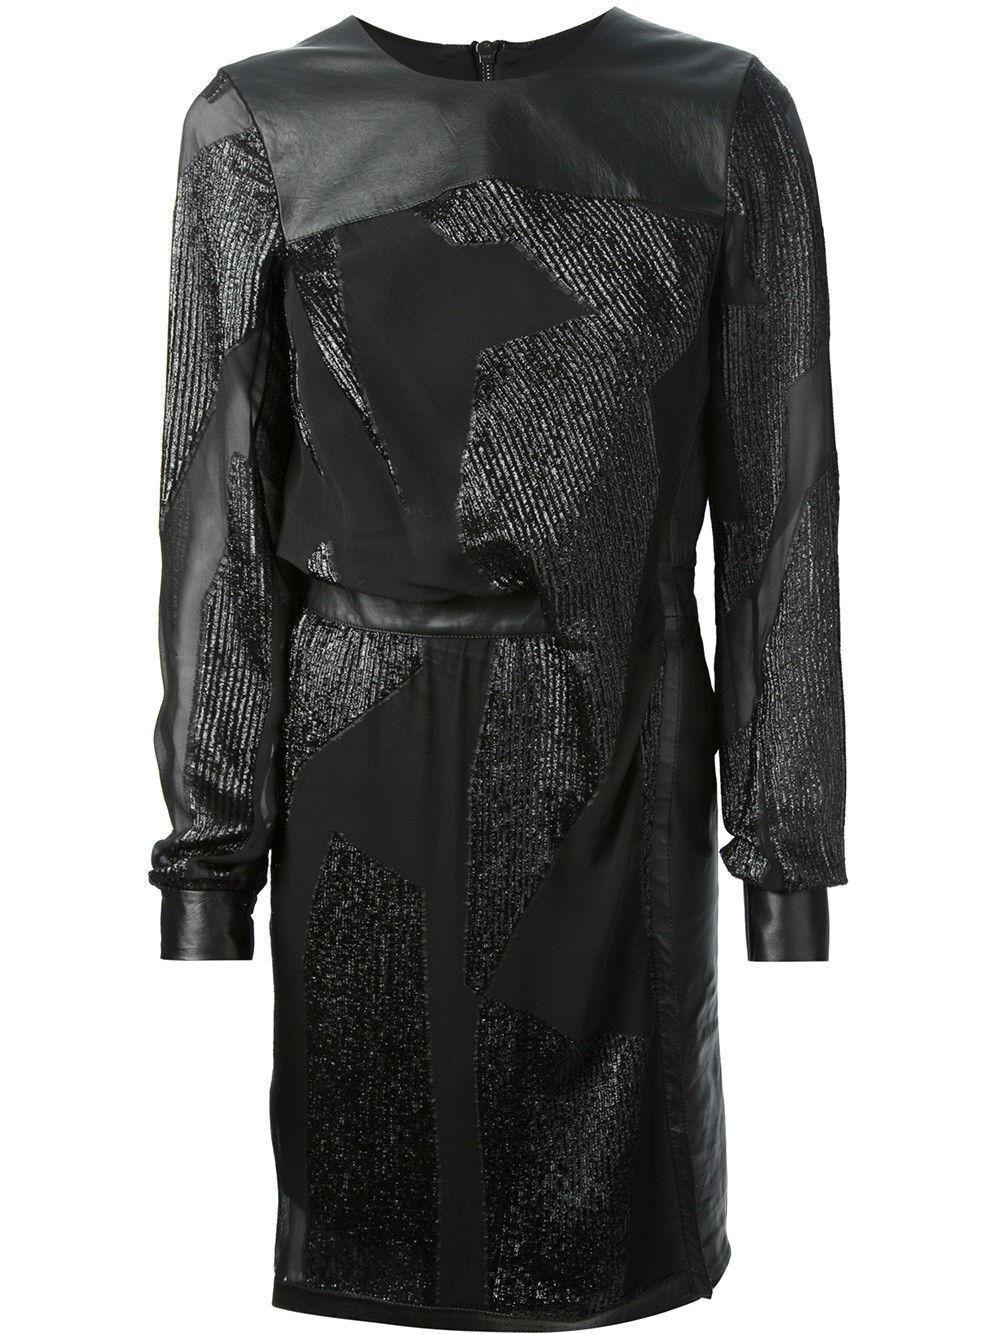 Helmut Lang Eros Füllung Coupe Schier Seide Seide Seide und Leder Metallisch Kleid ece382